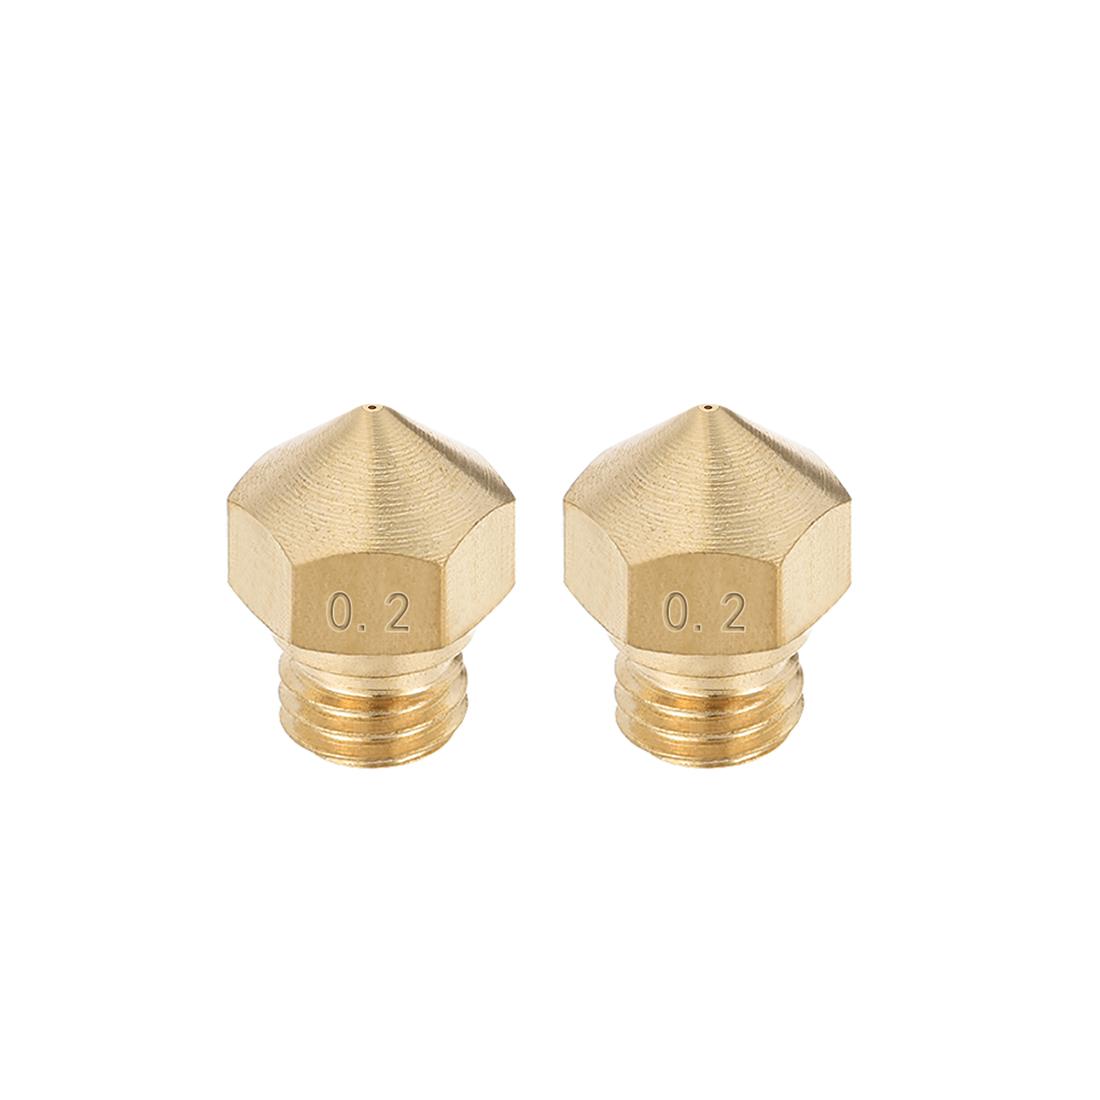 0.2mm 3D Printer Nozzle, Fit for MK10, for 1.75mm Filament Brass 2pcs